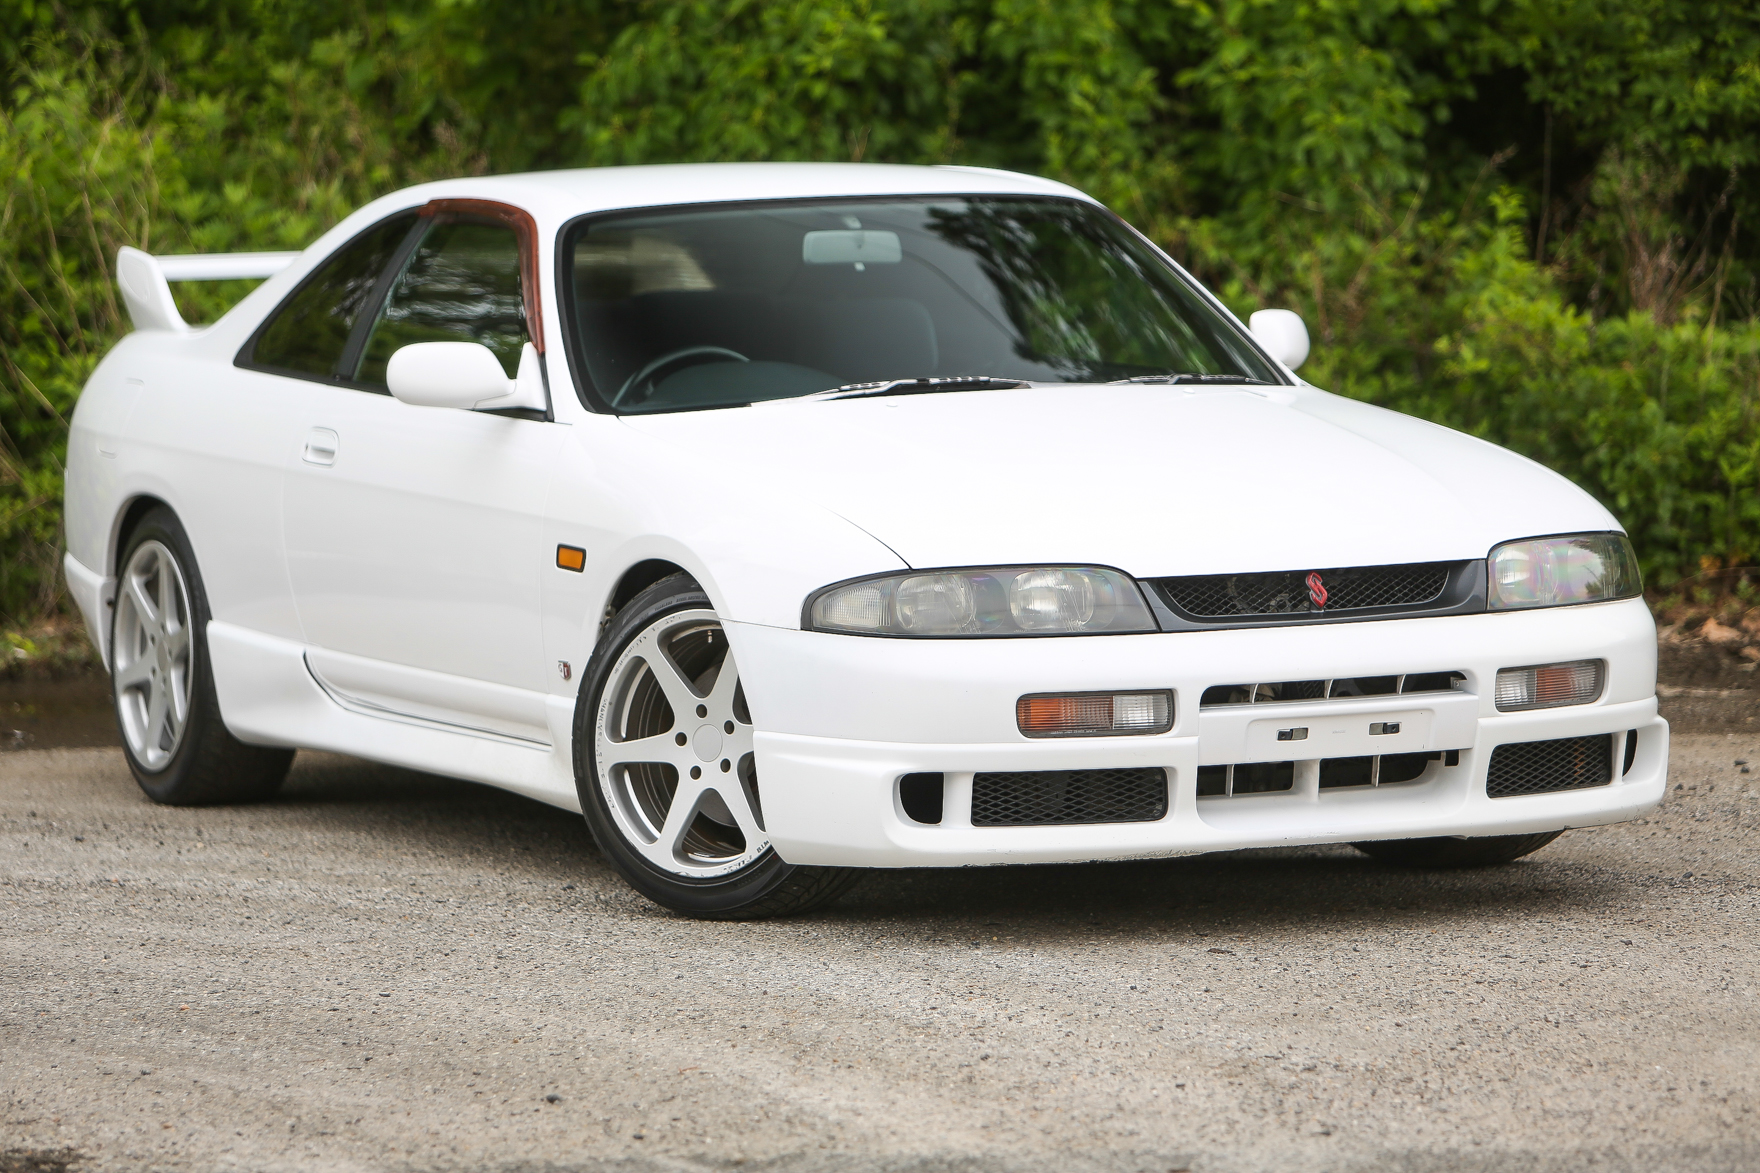 1995 Nissan Skyline R33 GTST - $24,950